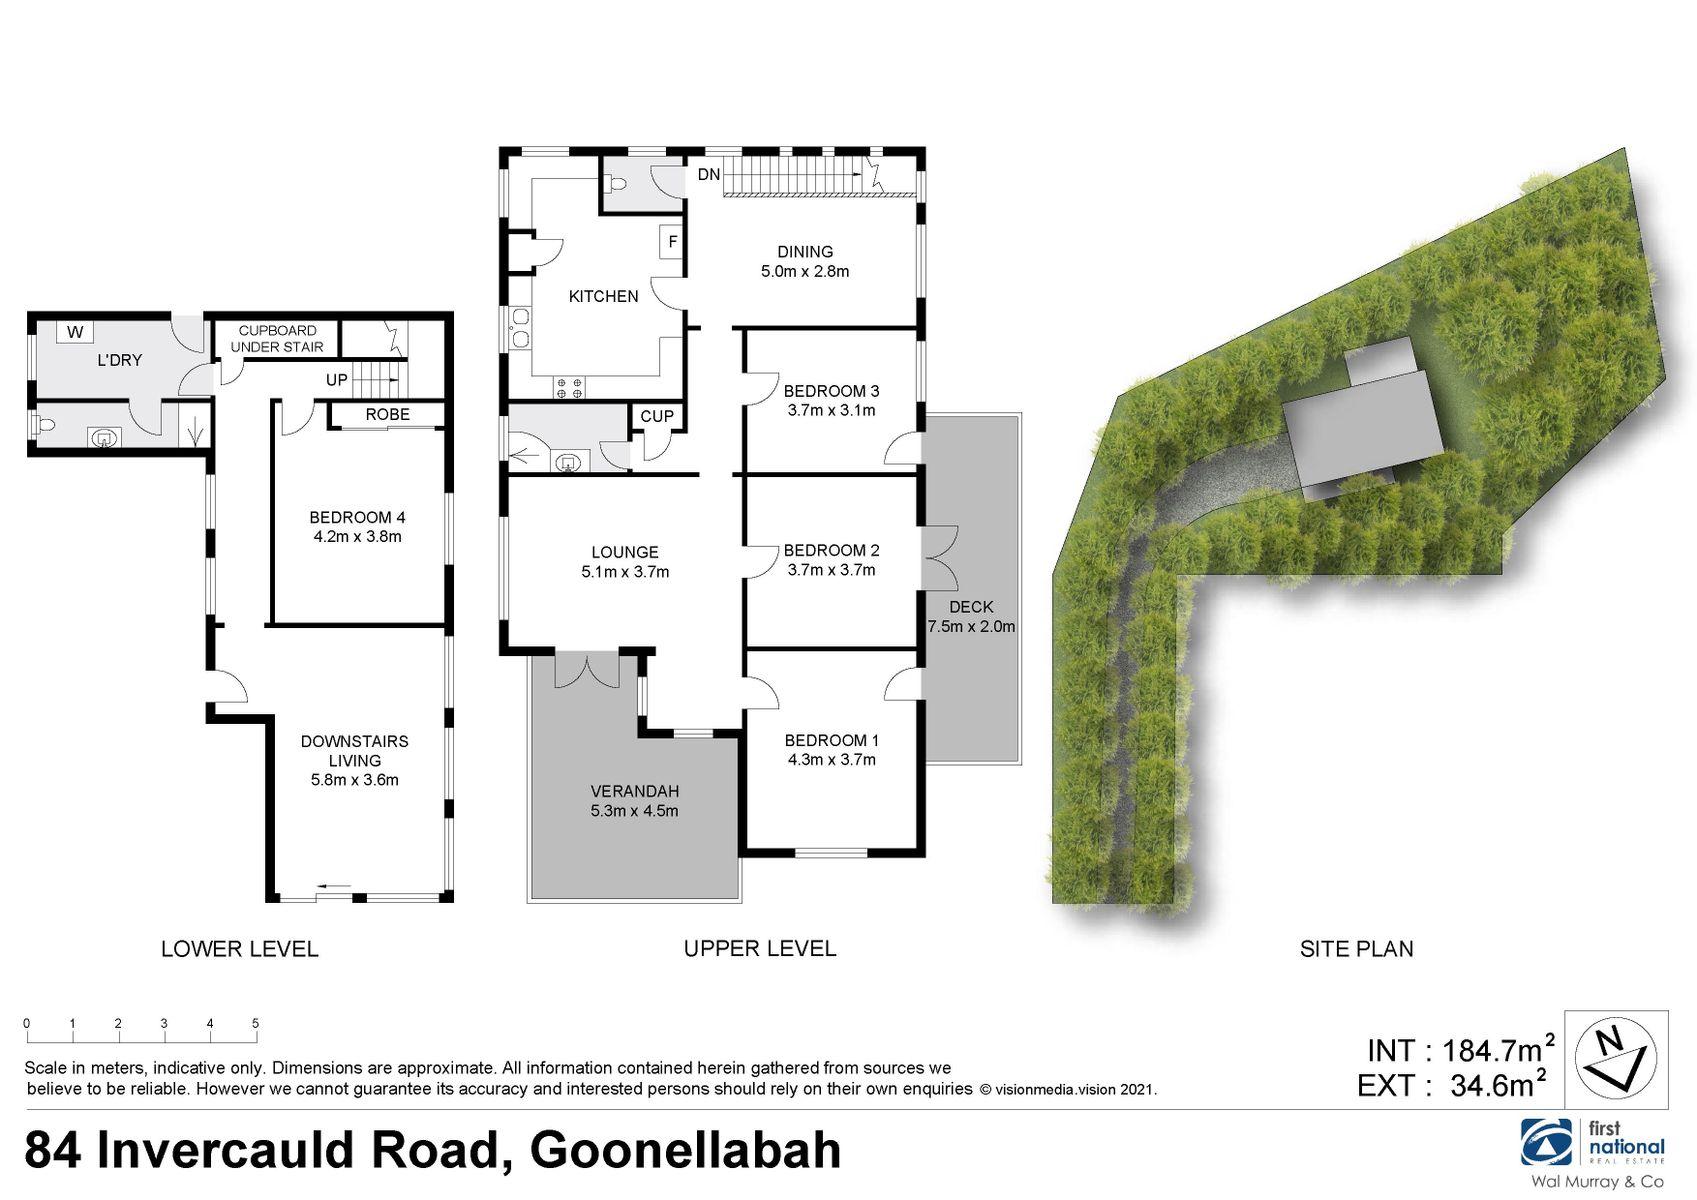 84 Invercauld Road, Goonellabah, NSW 2480